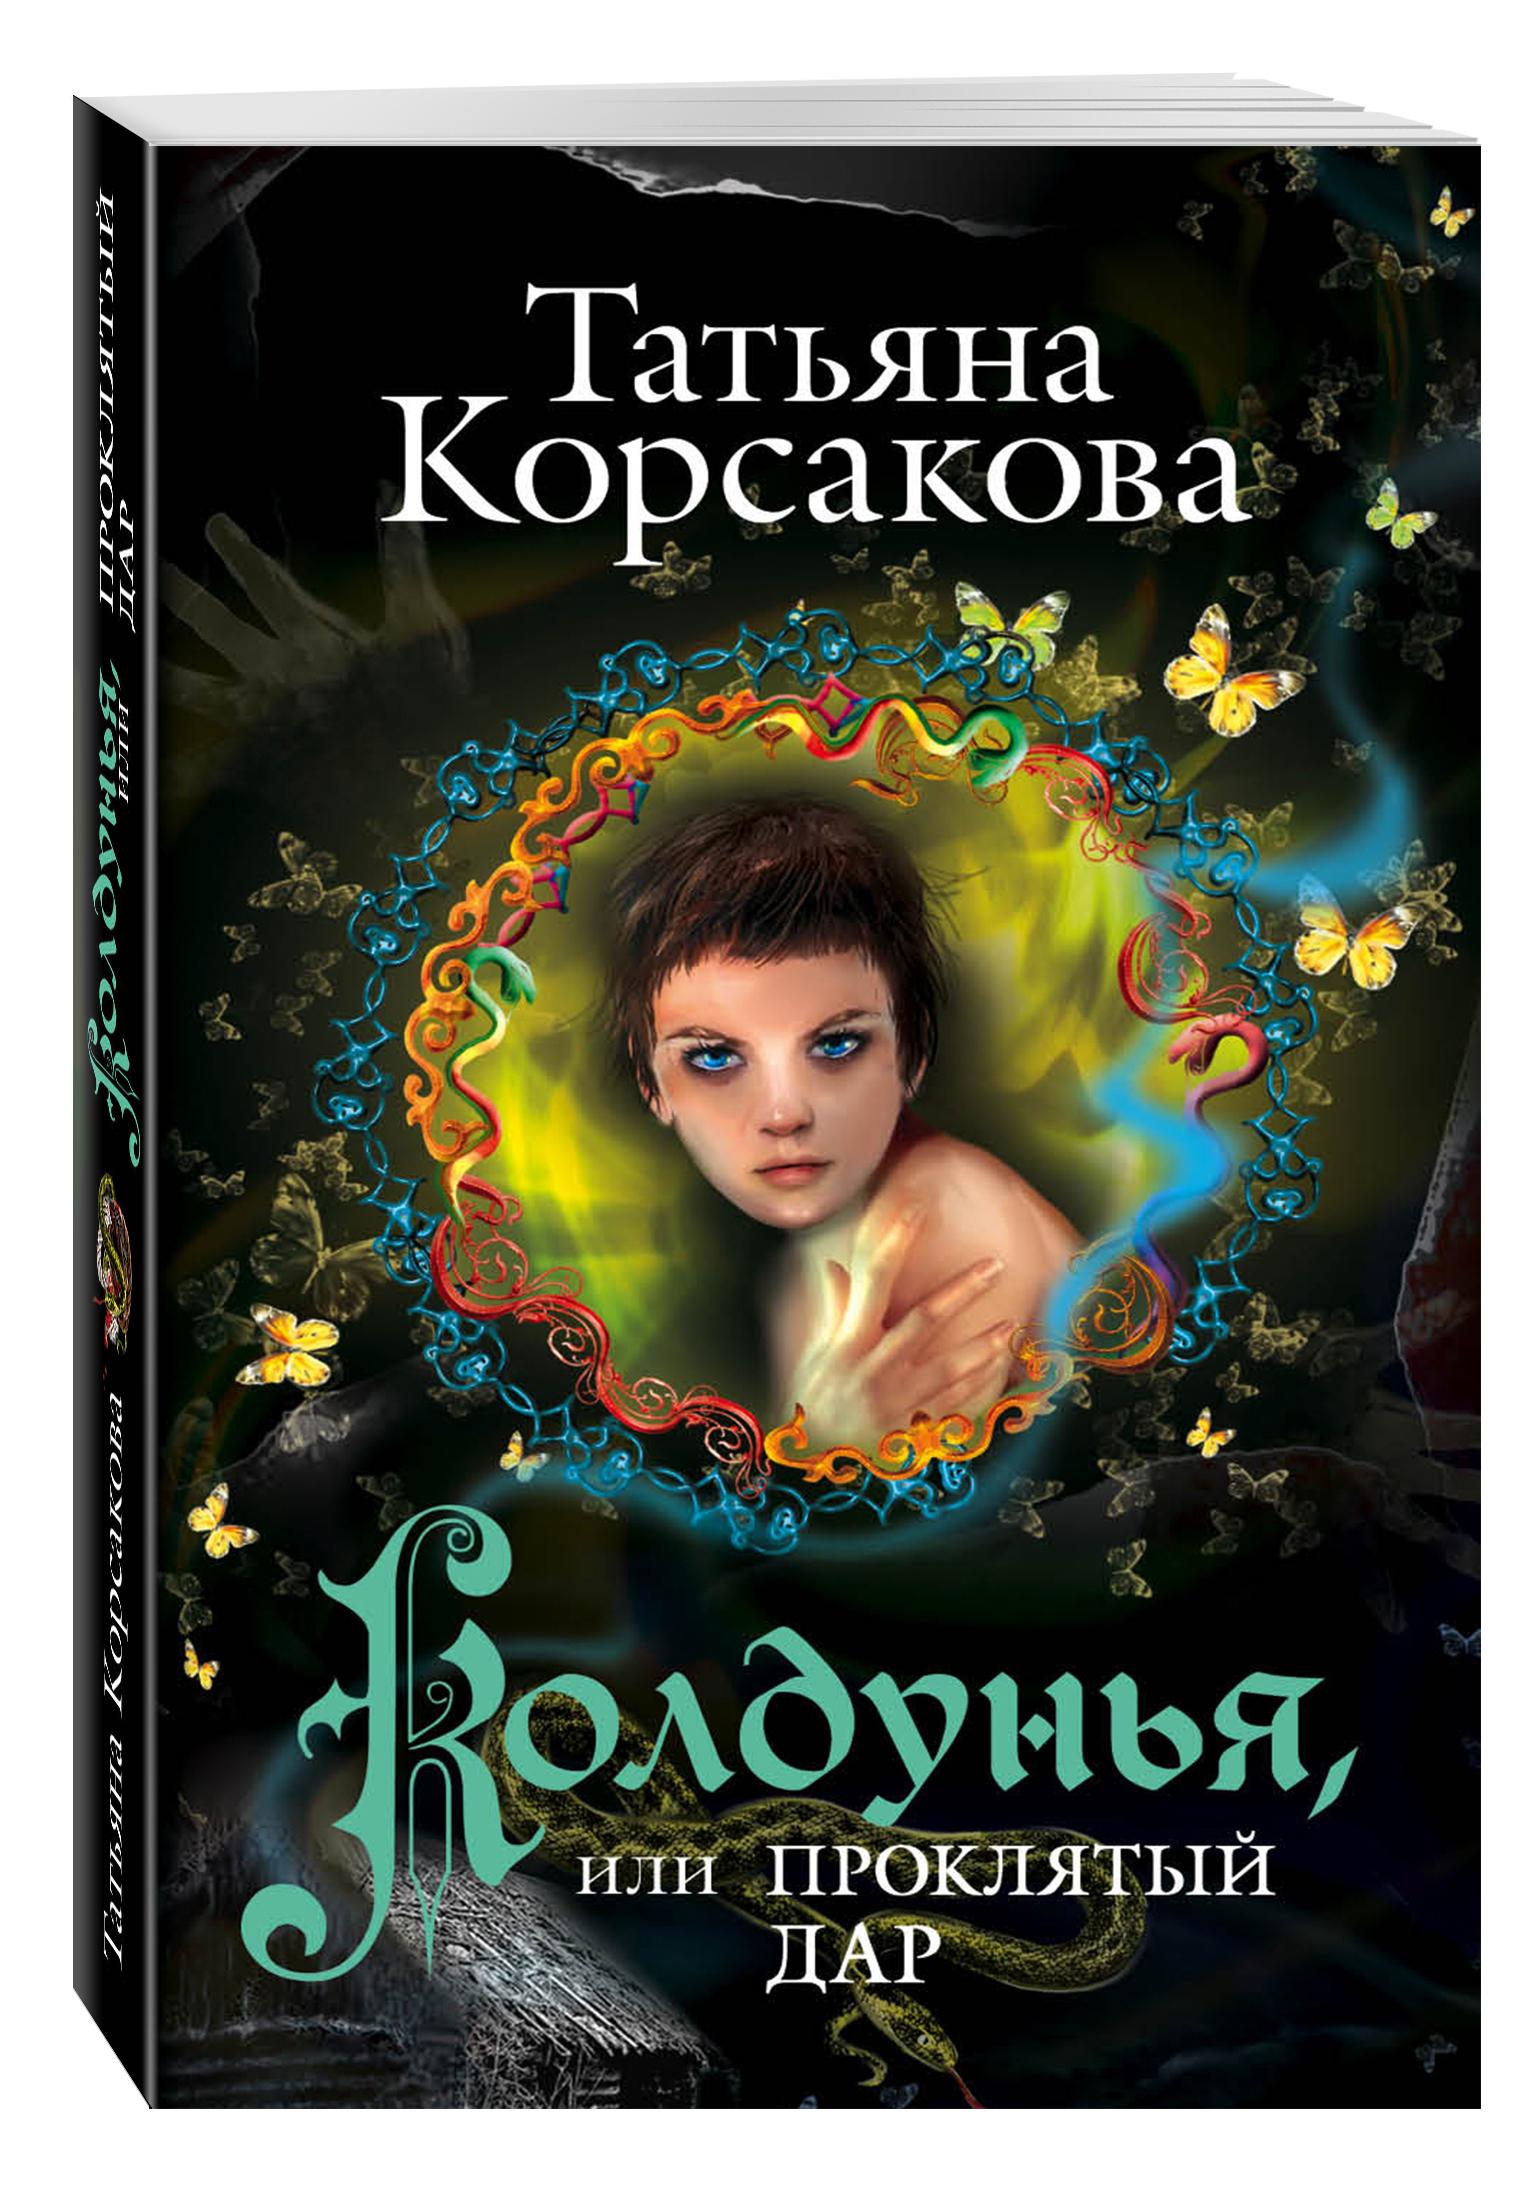 Корсакова Т. Колдунья, или Проклятый дар недорого